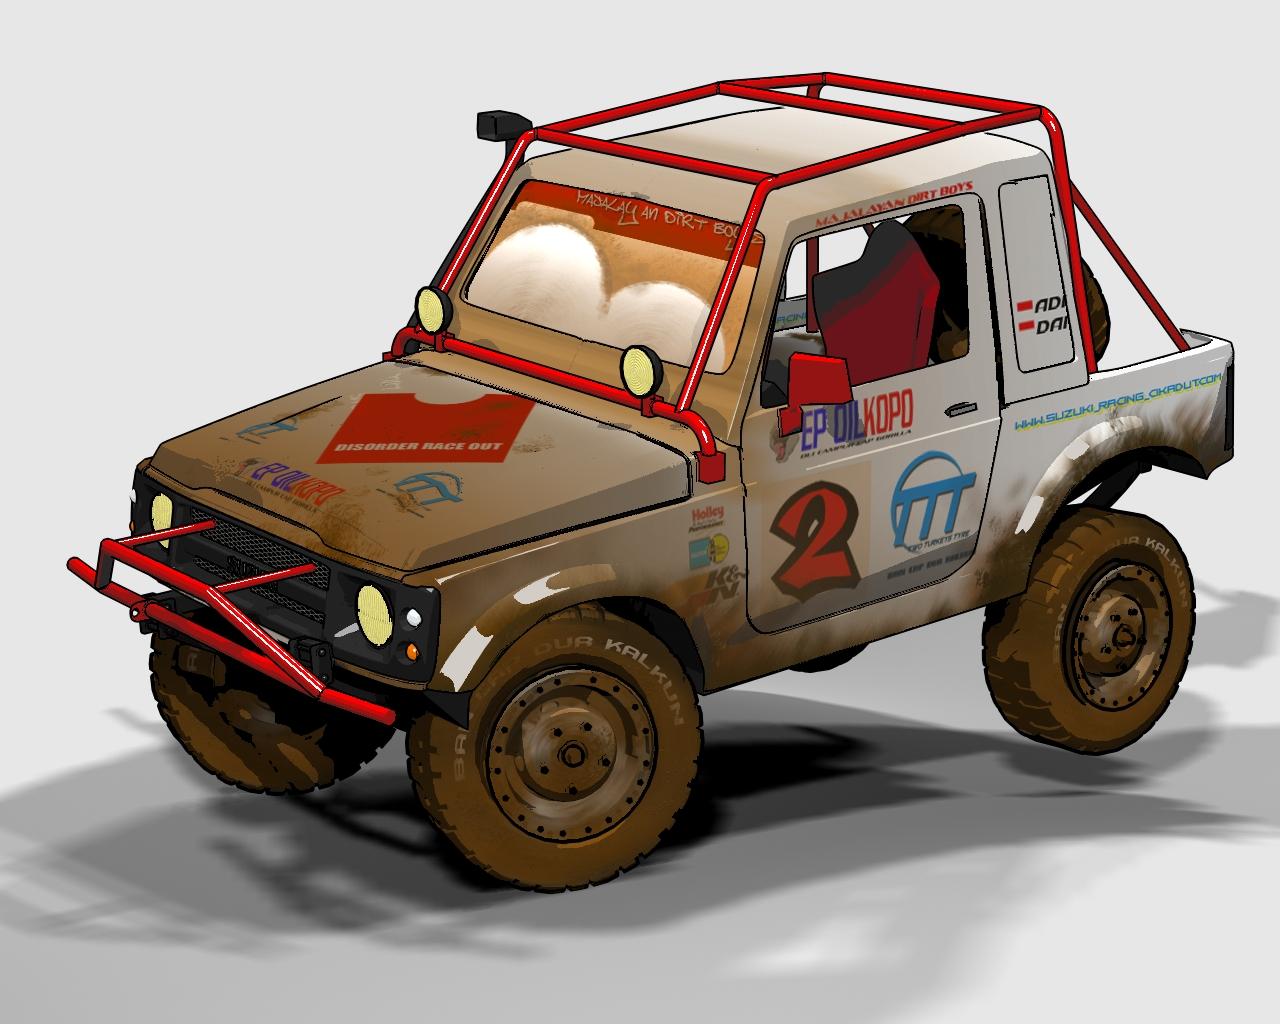 Suzuki Samurai Logo Vector (.EPS) Free Download  |Cartoon Suzuki Samurai